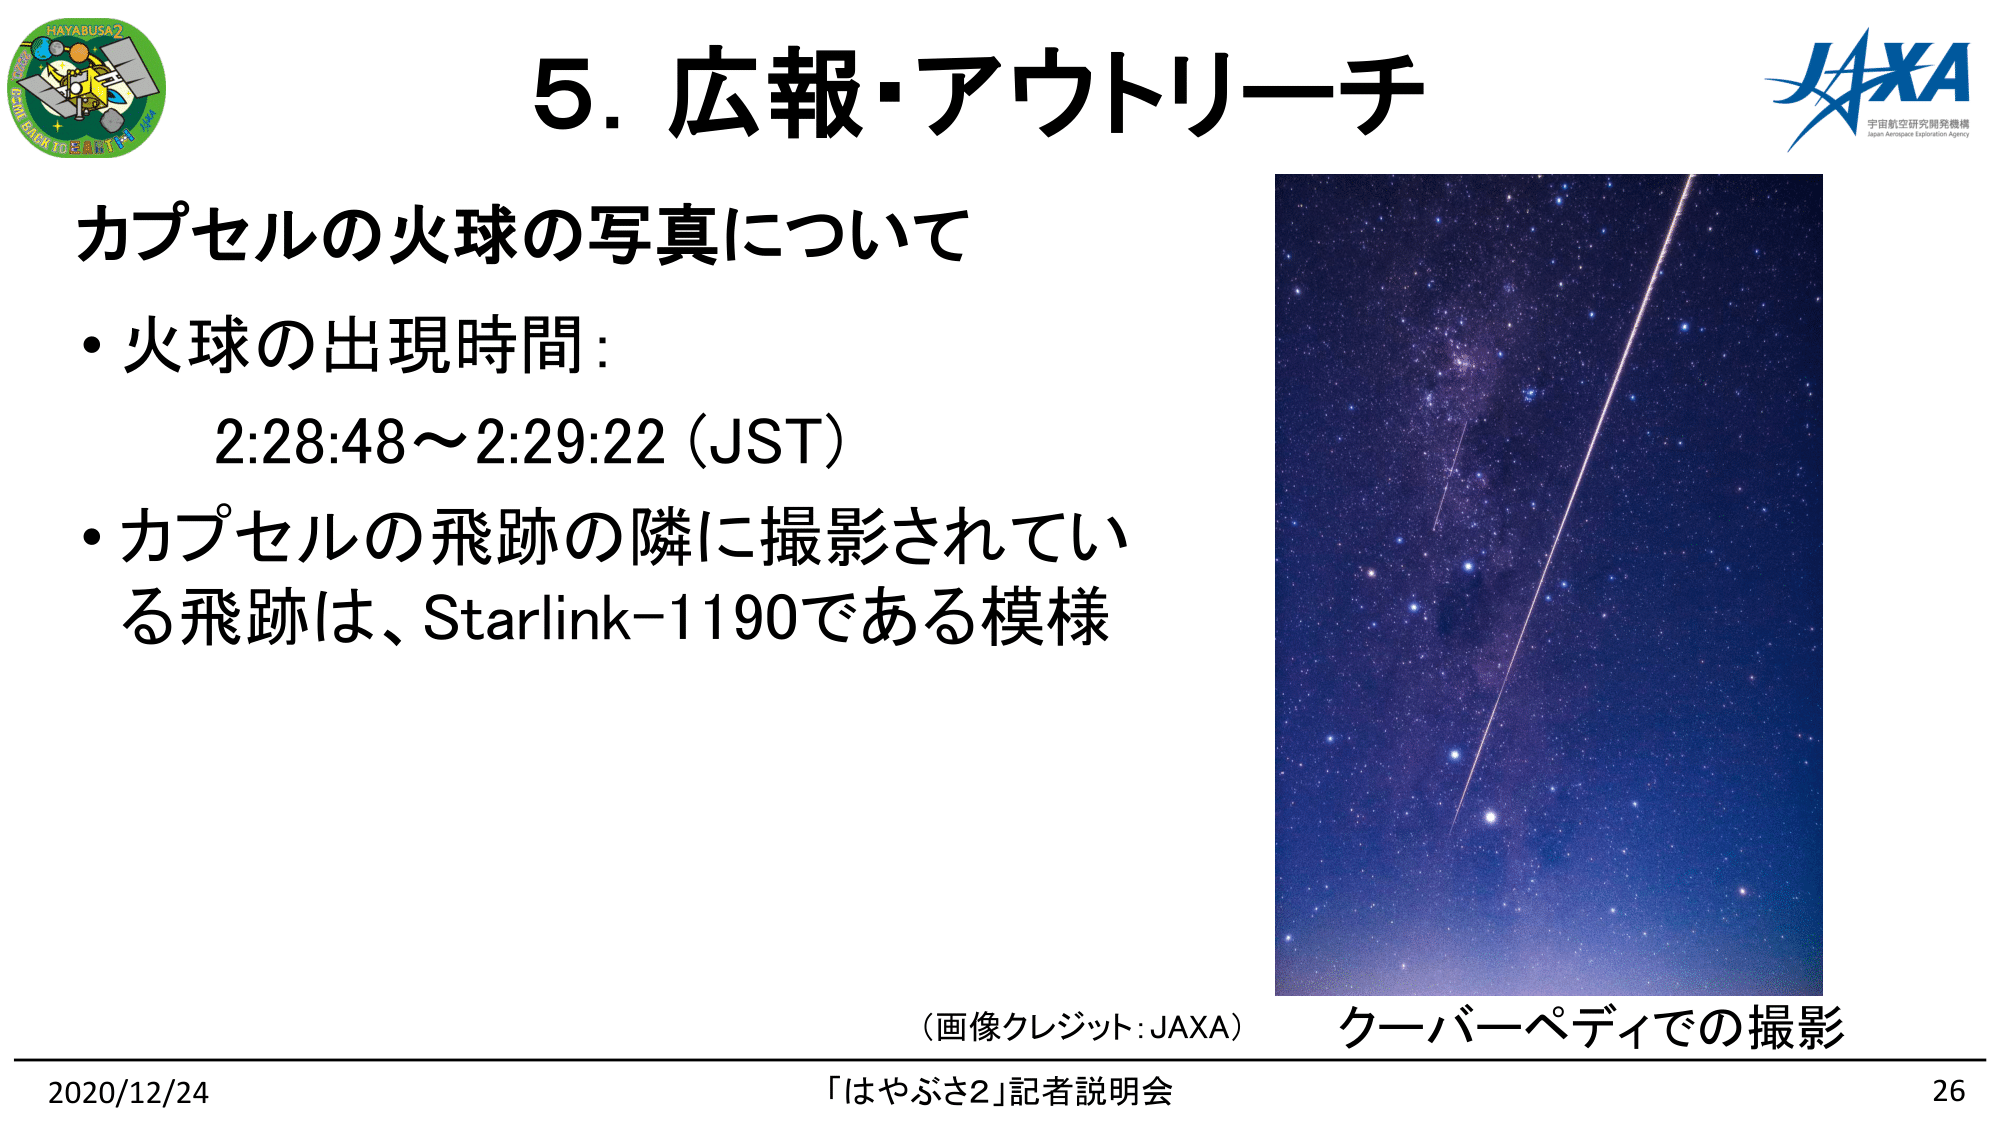 f:id:Imamura:20201224135254p:plain